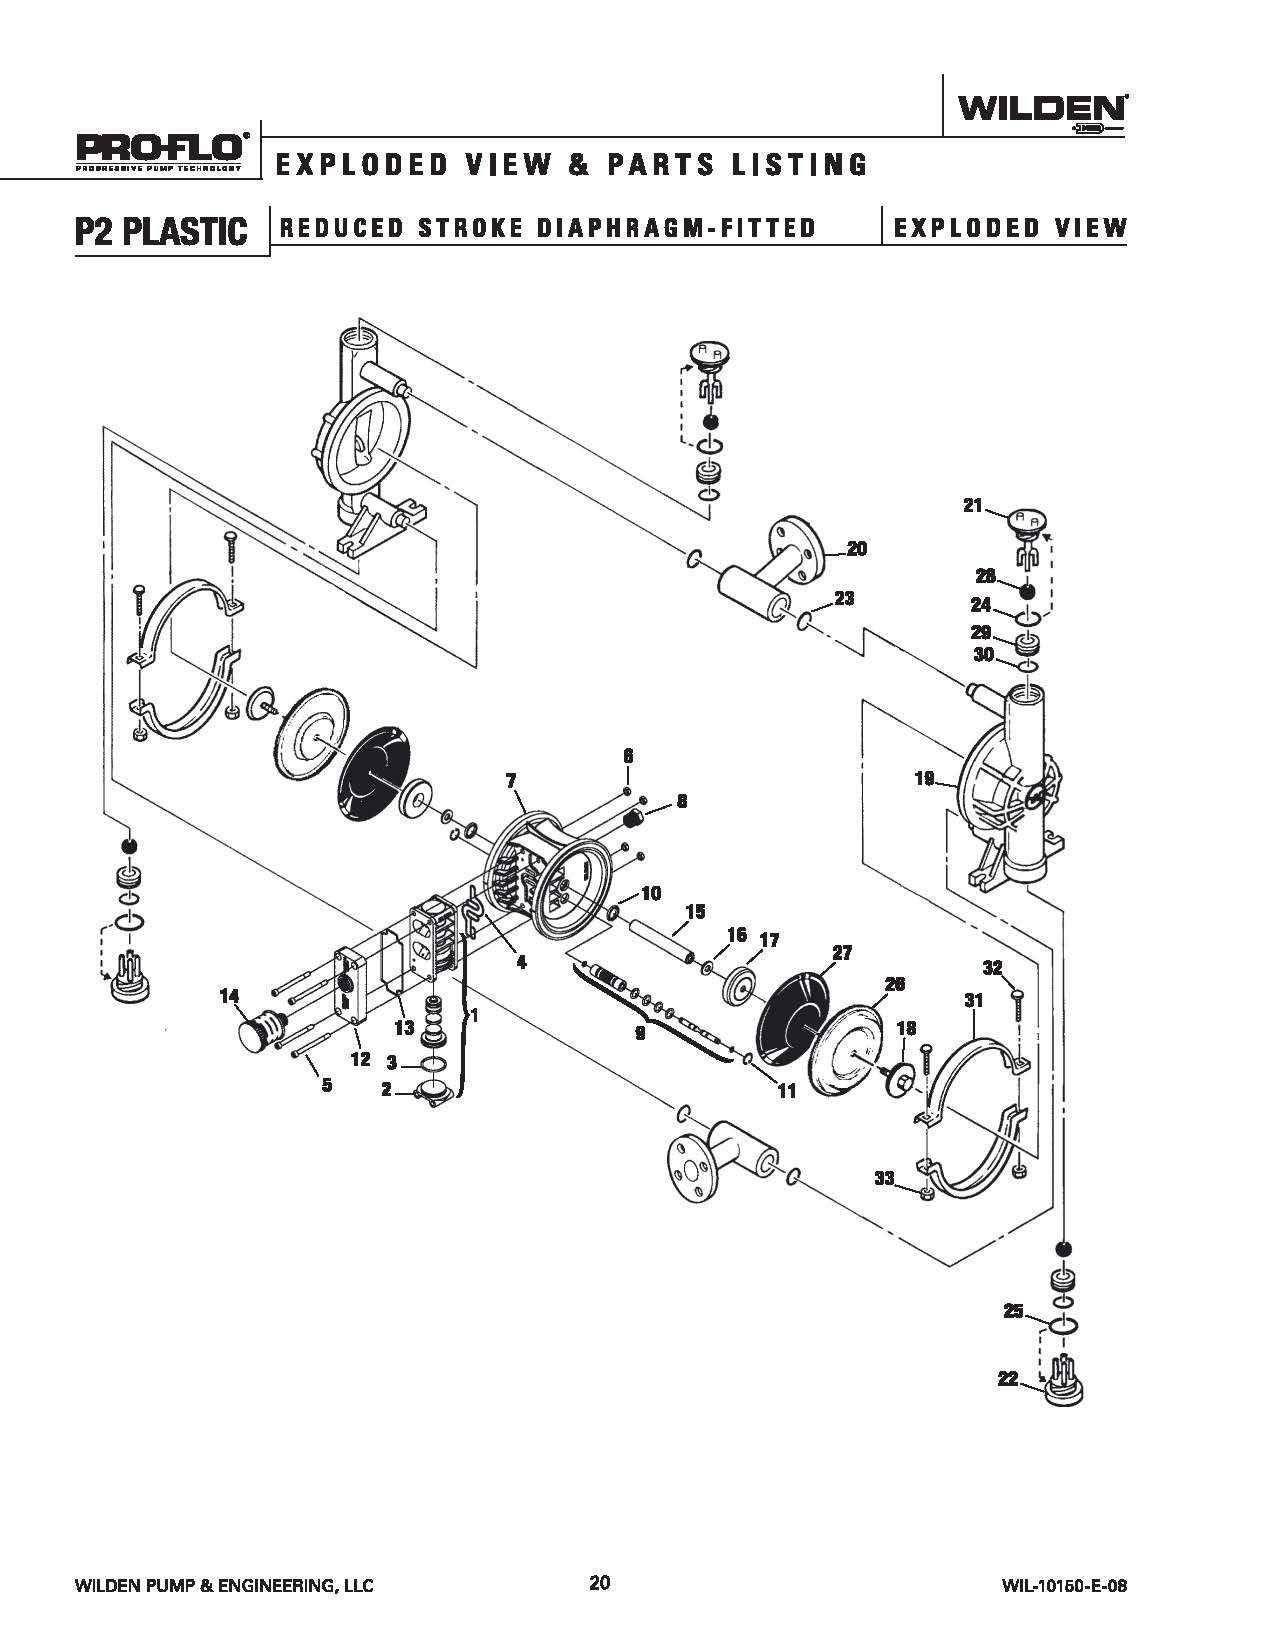 Wilden p2 original plastic reduced stroke ptfe pumping solutions wilden p2 original plastic reduced stroke ptfe sciox Image collections